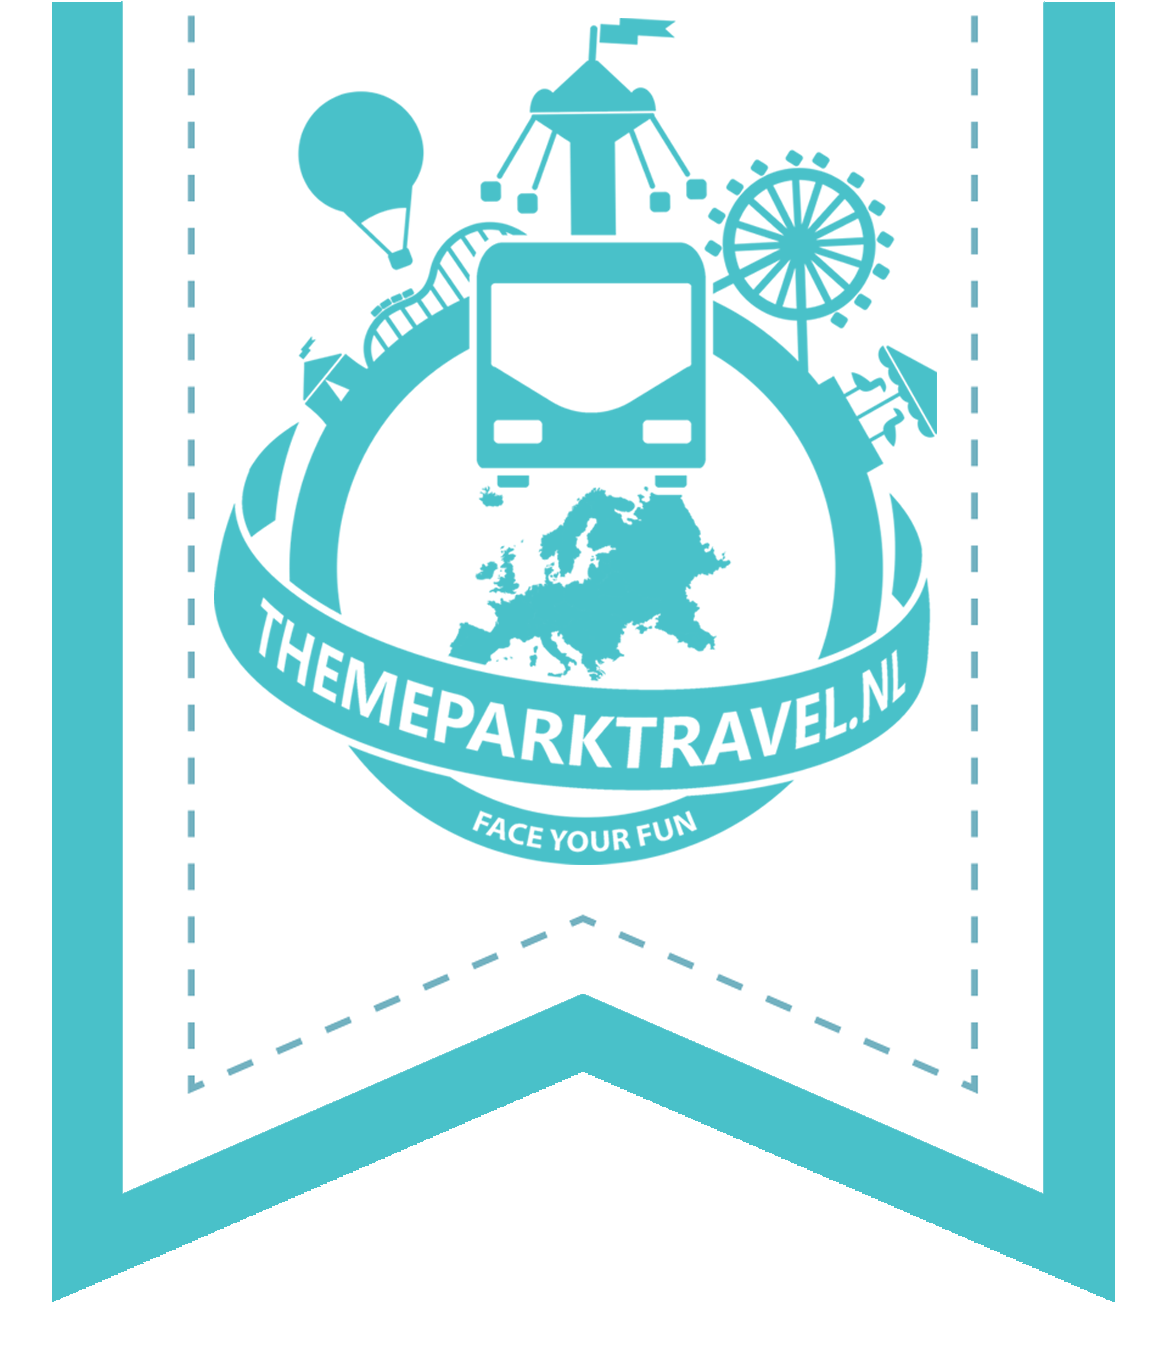 Themeparktravel